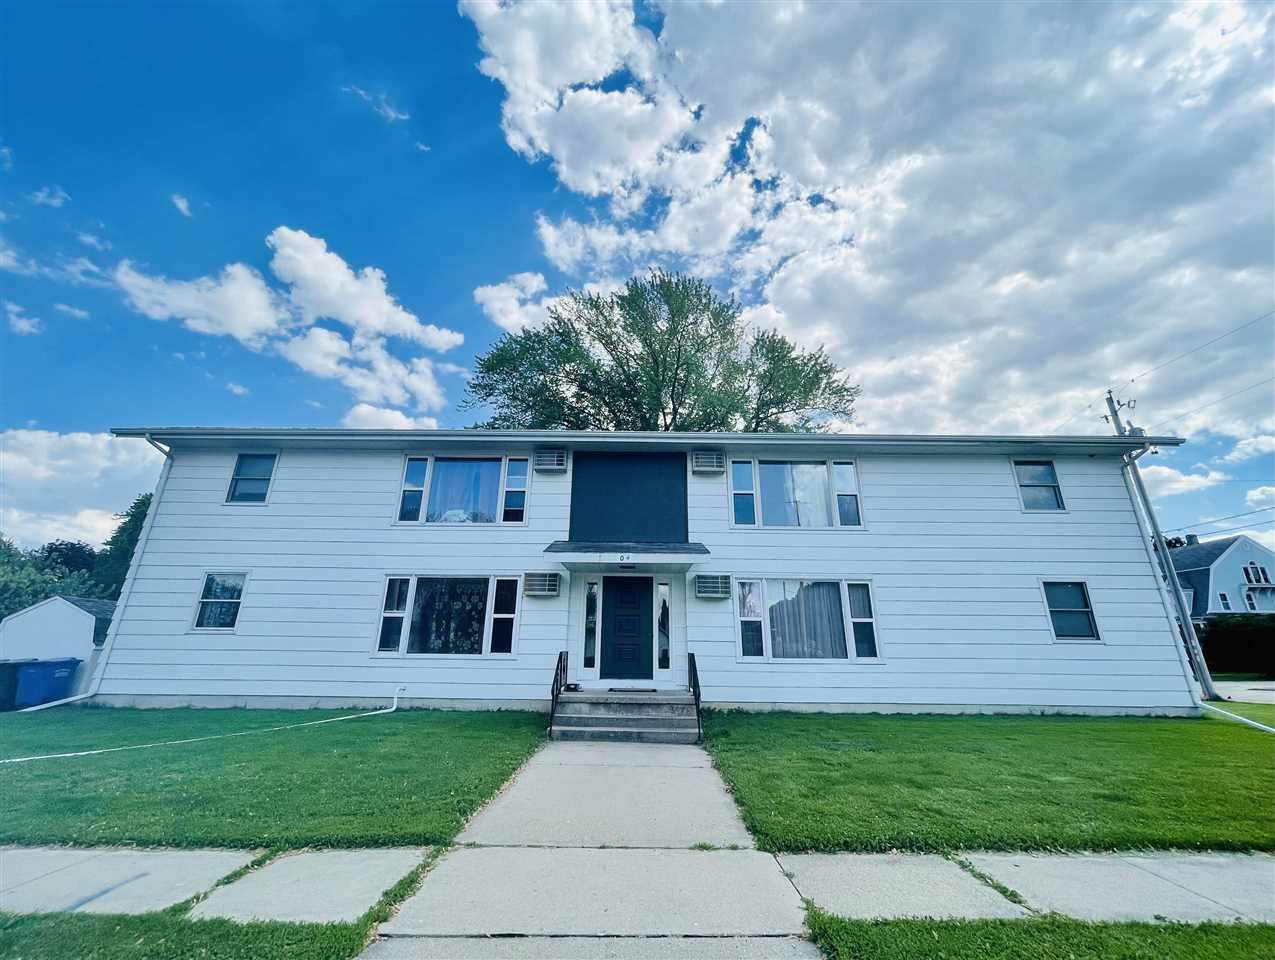 104 Grove St, Randolph, WI 53956 - #: 1900117